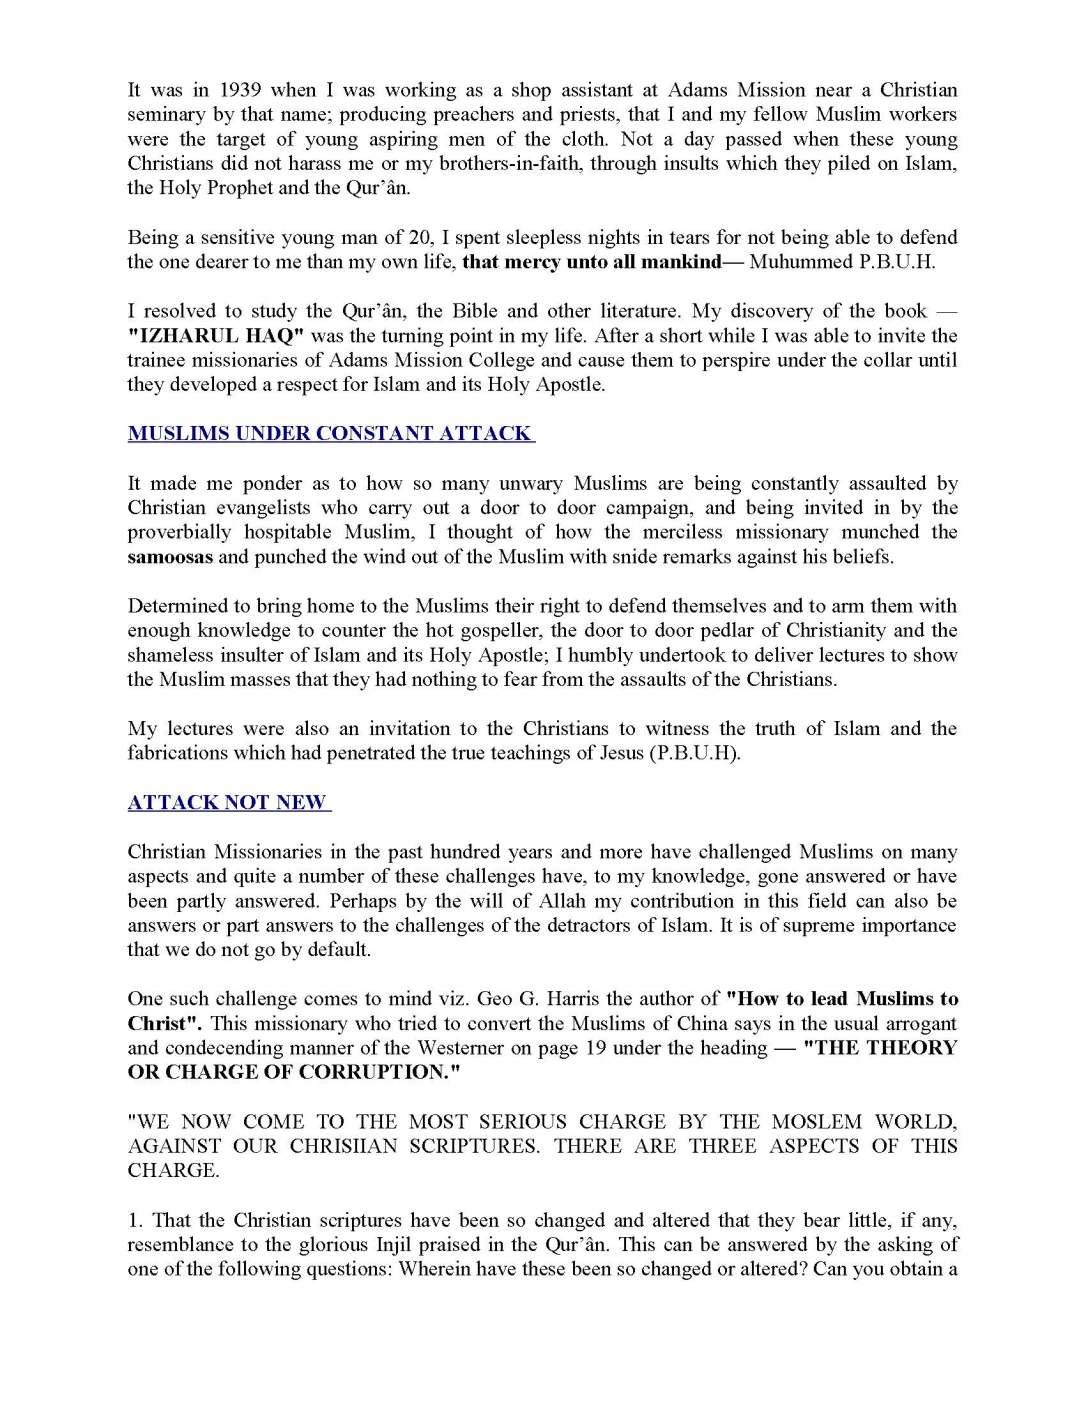 Is The Bible Gods Word [deedat]_Page_45